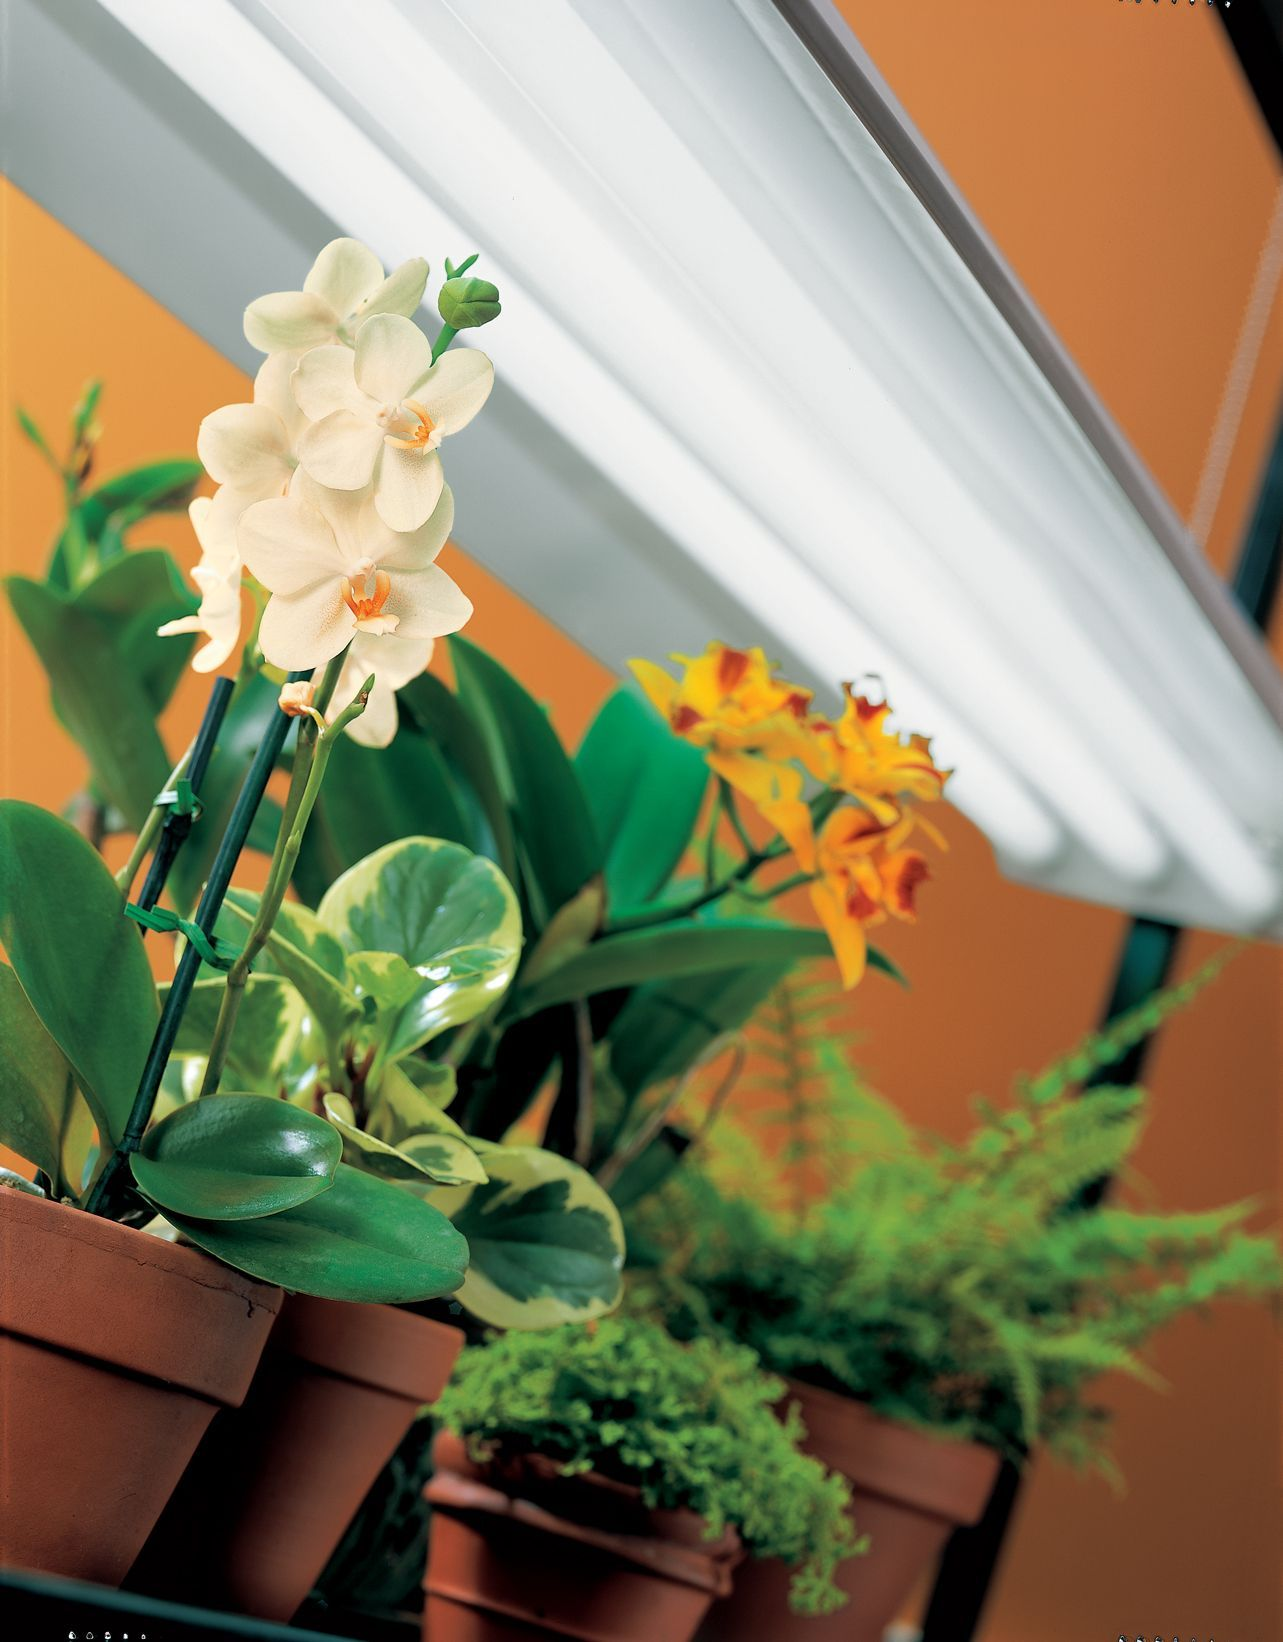 Black SunLite® Fixture with 3 Bulbs